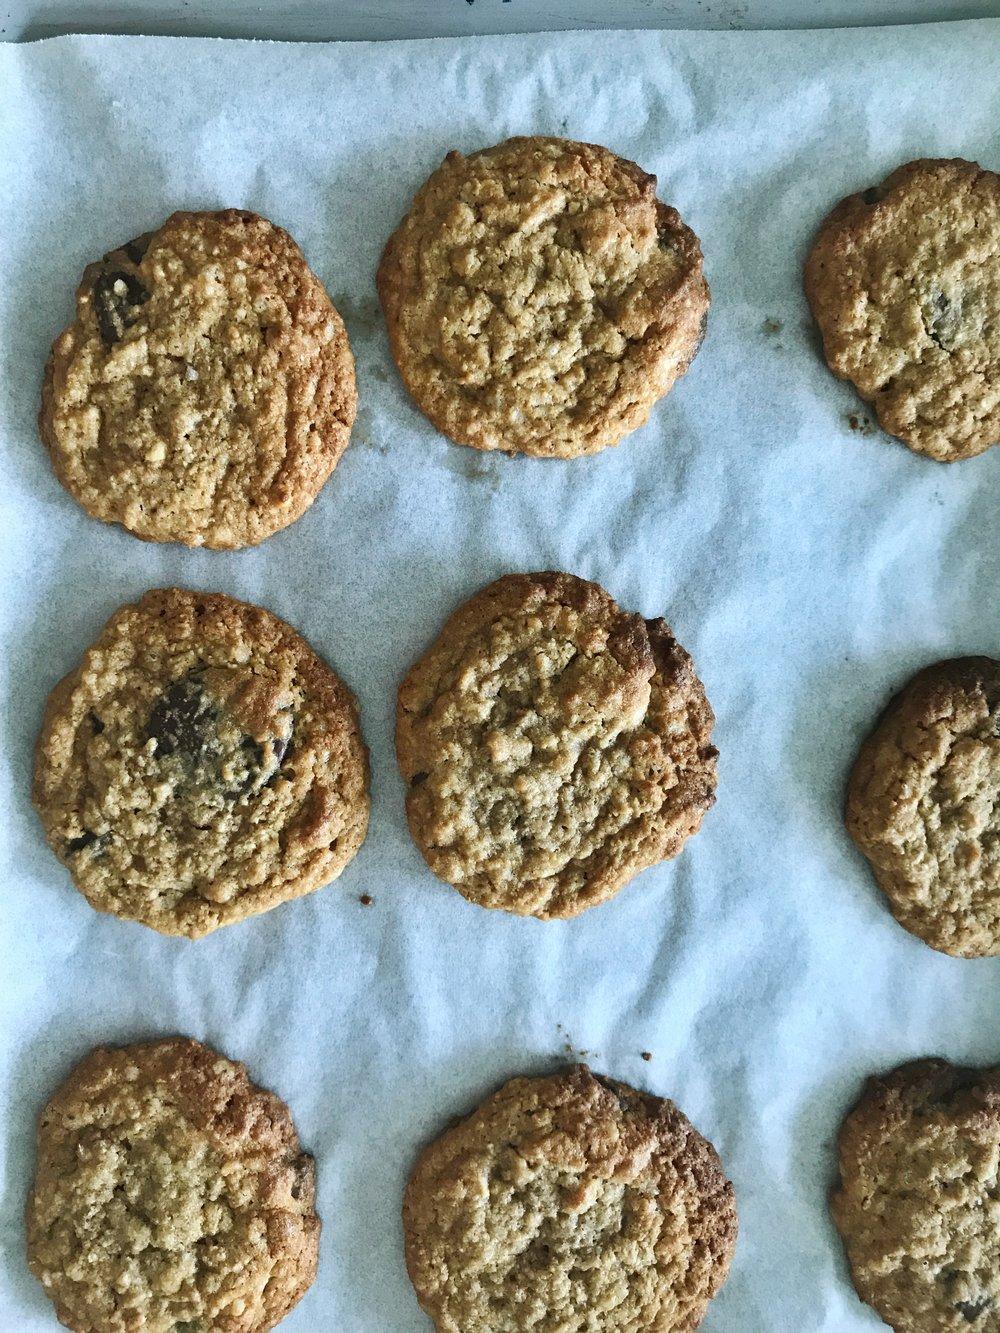 24hourkitchen-recipe-sweetish.co-oat-spelt-chocolate-chip-cookies